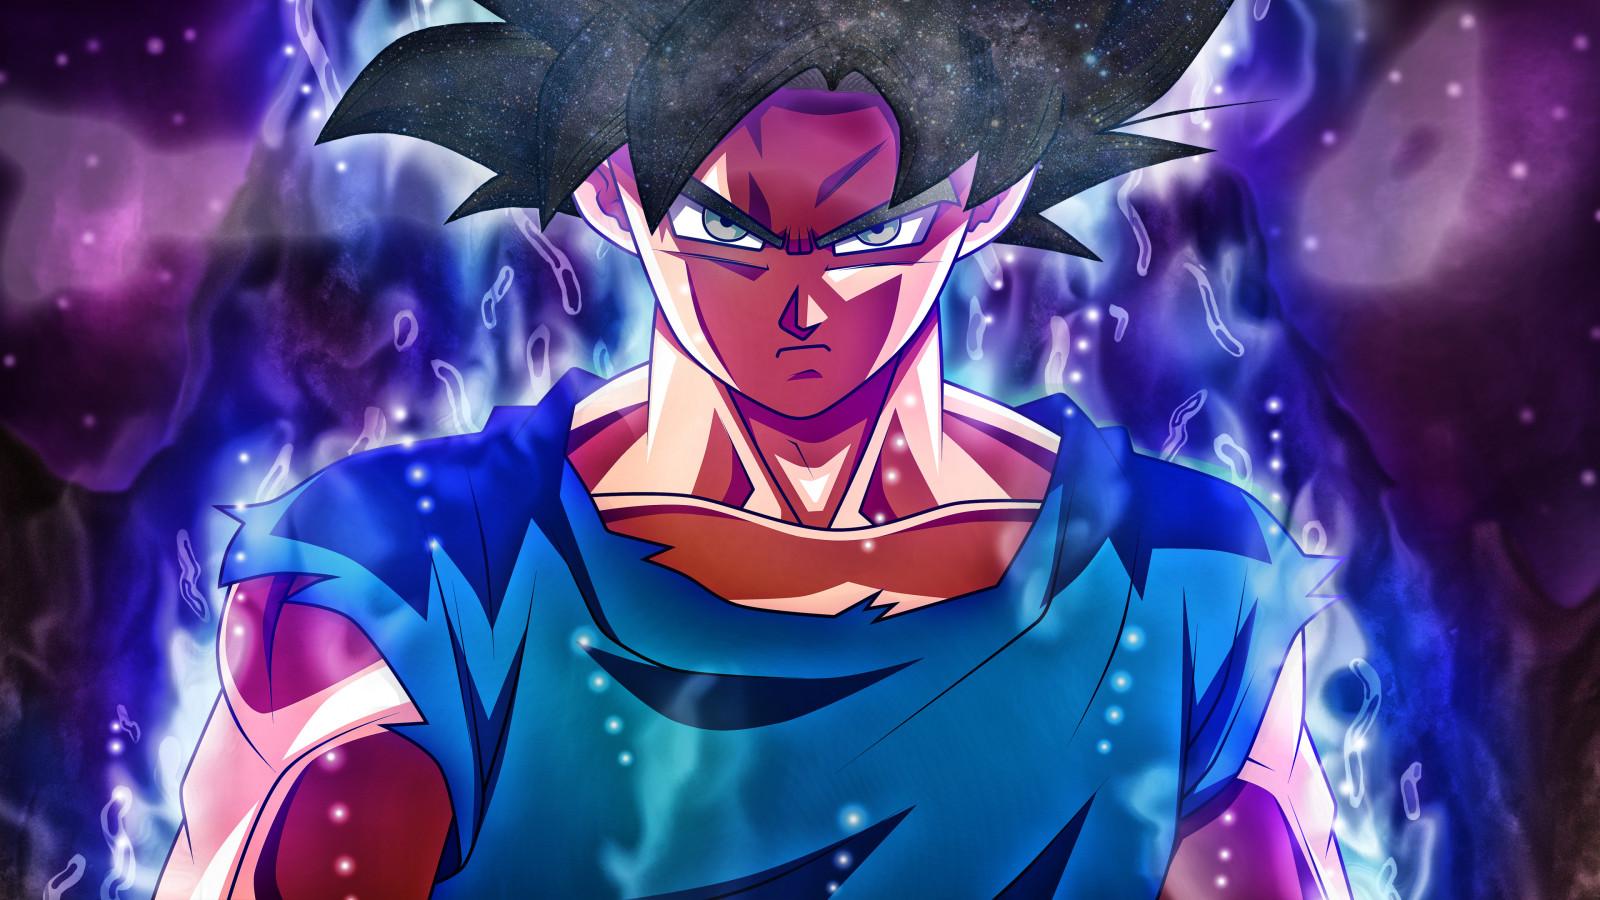 Fond d'écran : Son Goku, Ultra Instinct Goku, Dragon Ball, DBS, Dragon Ball Super 3840x2160 ...